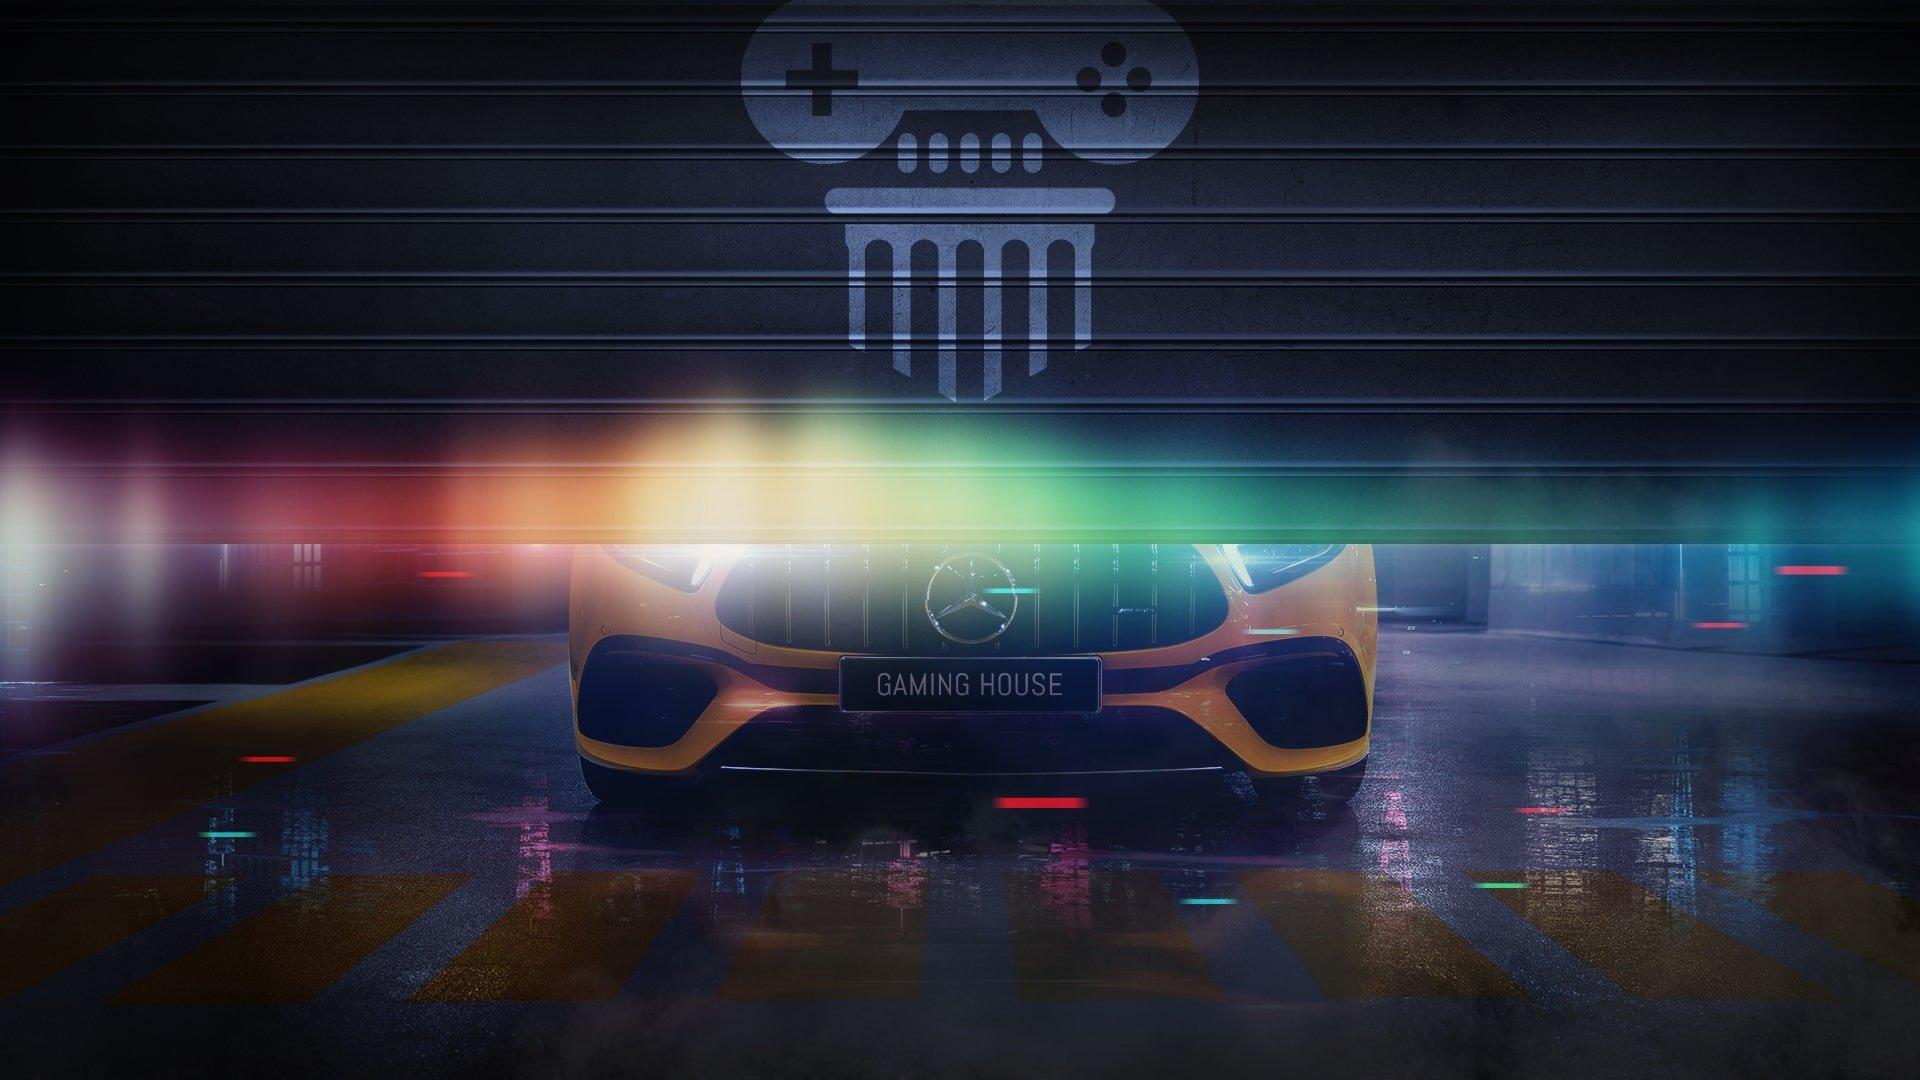 Mercedes-Benz Italia è Official Title Sponsor della Gaming House di Mkers